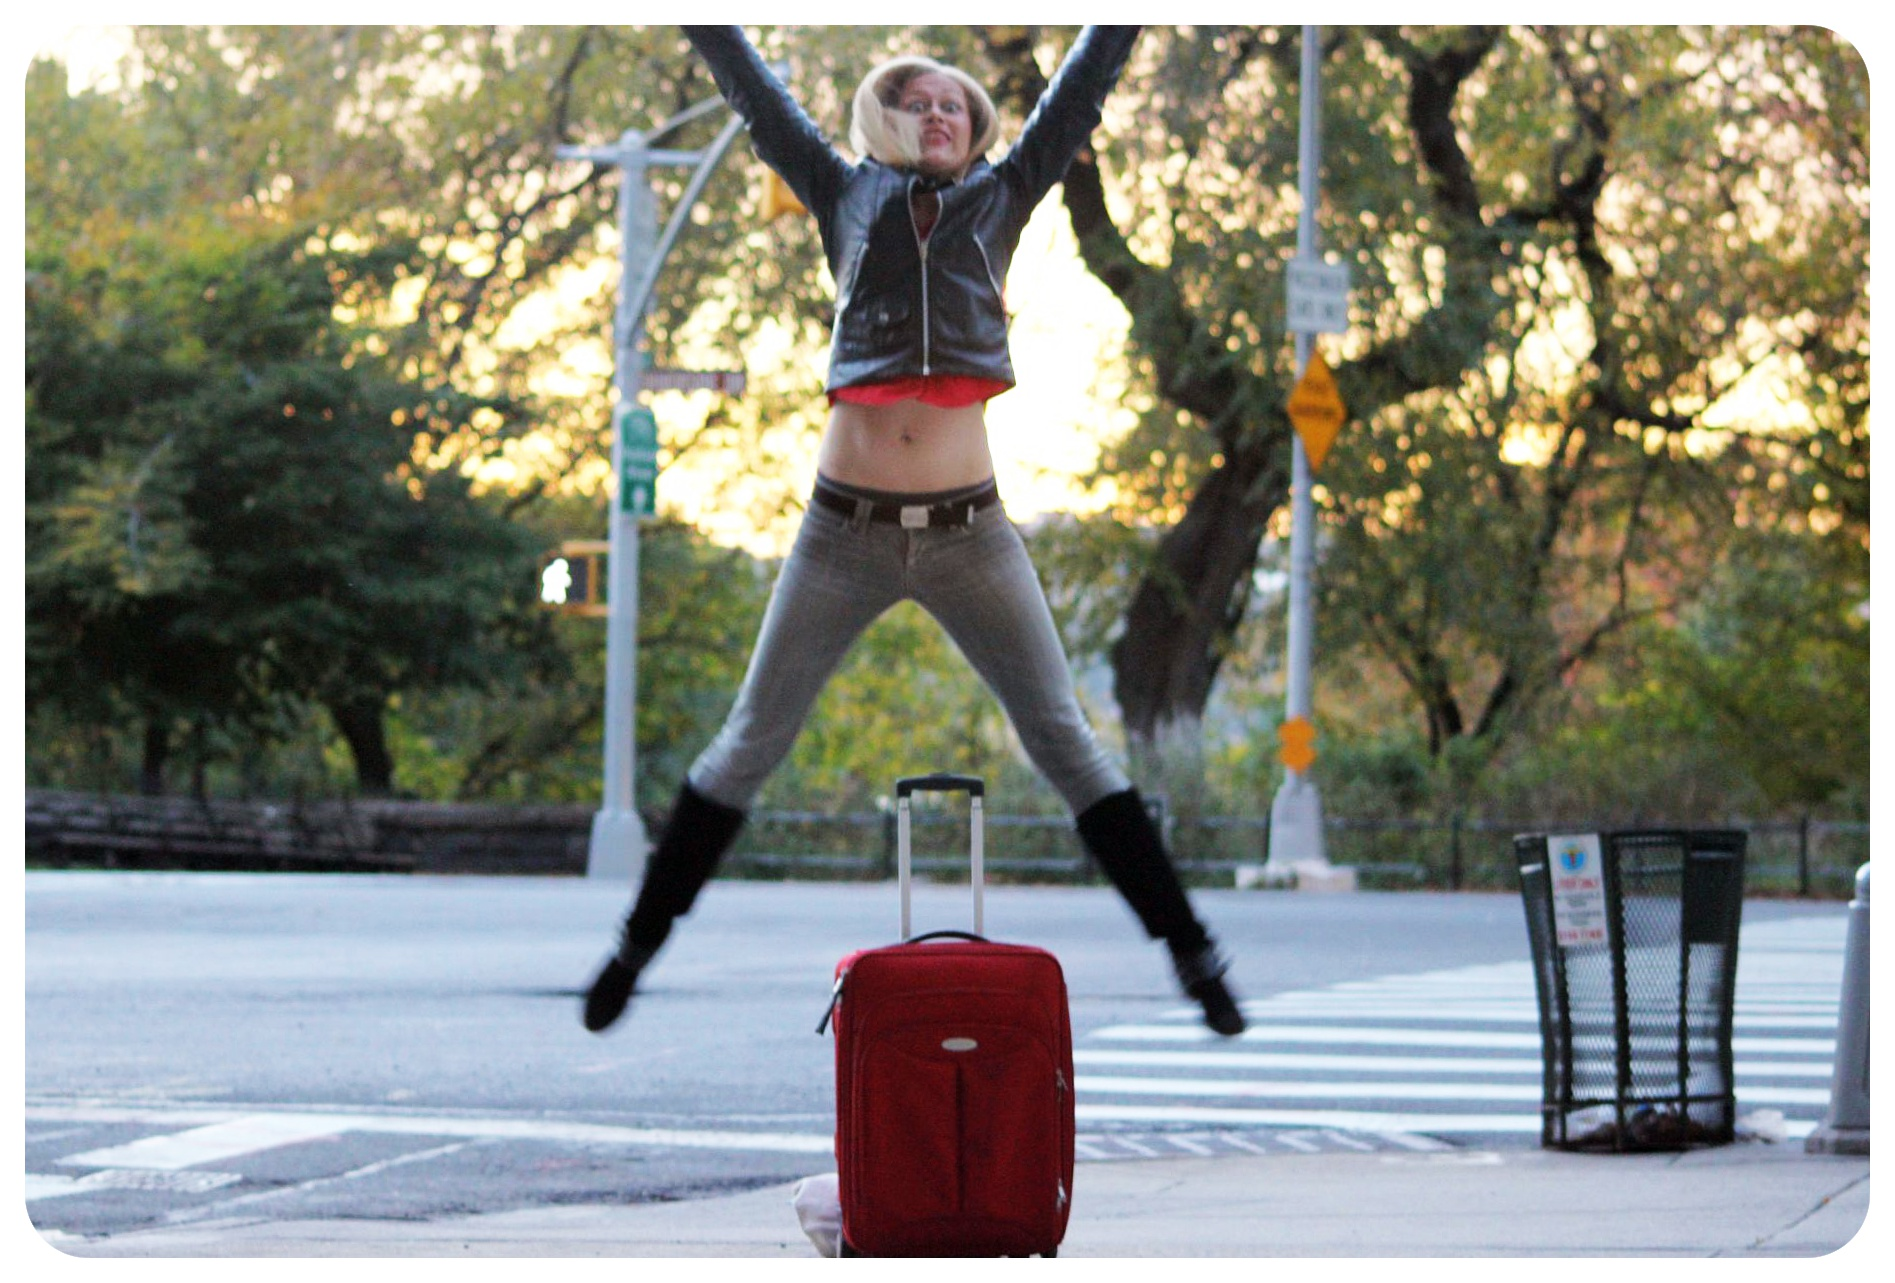 luggage jump